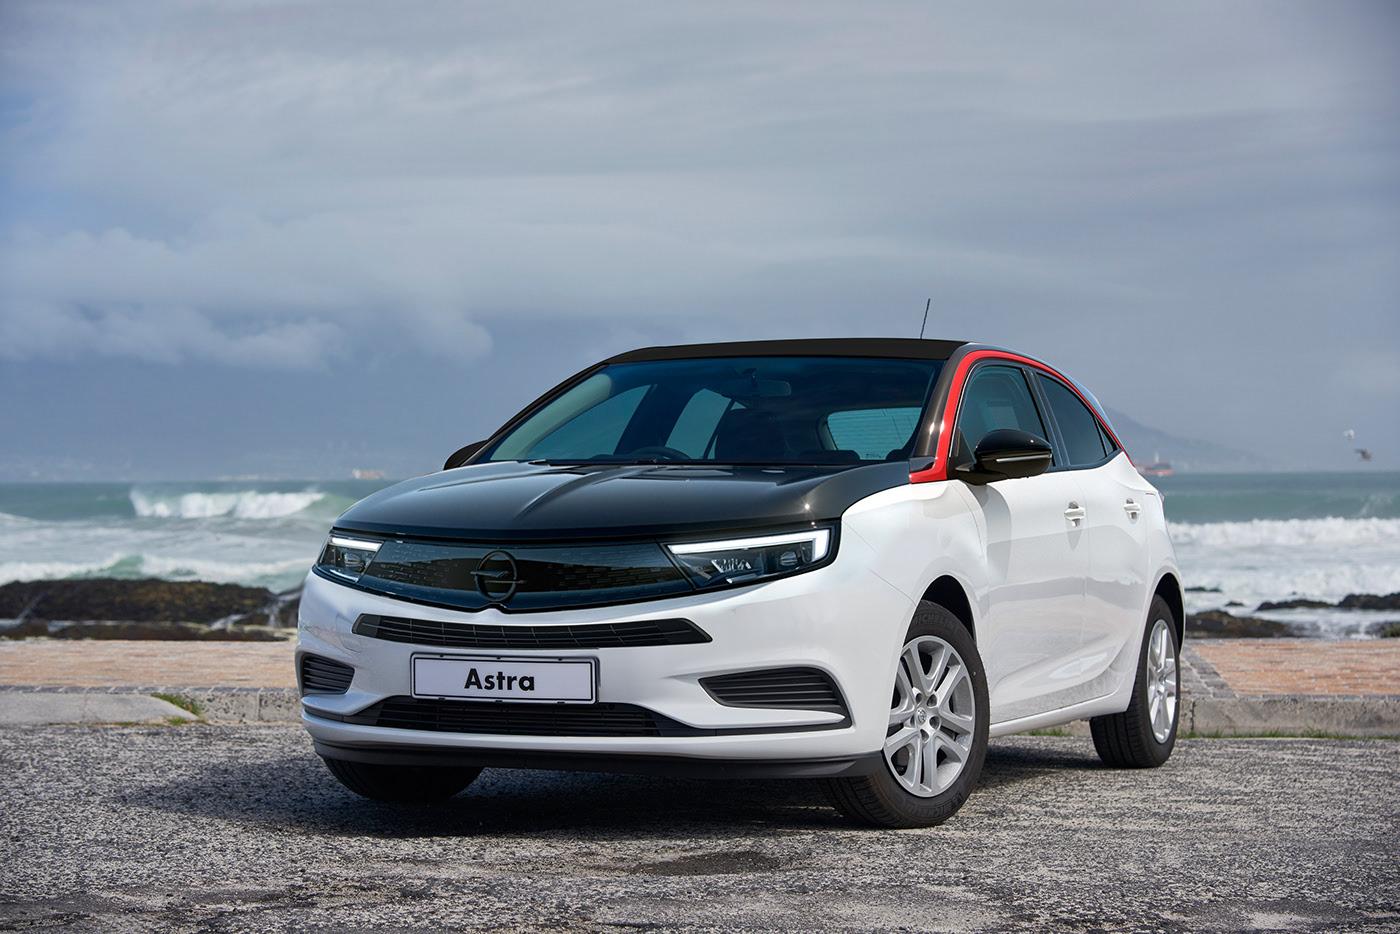 Next-Gen 4 Opel Astra Rendered with Mokka Design - autoevolution